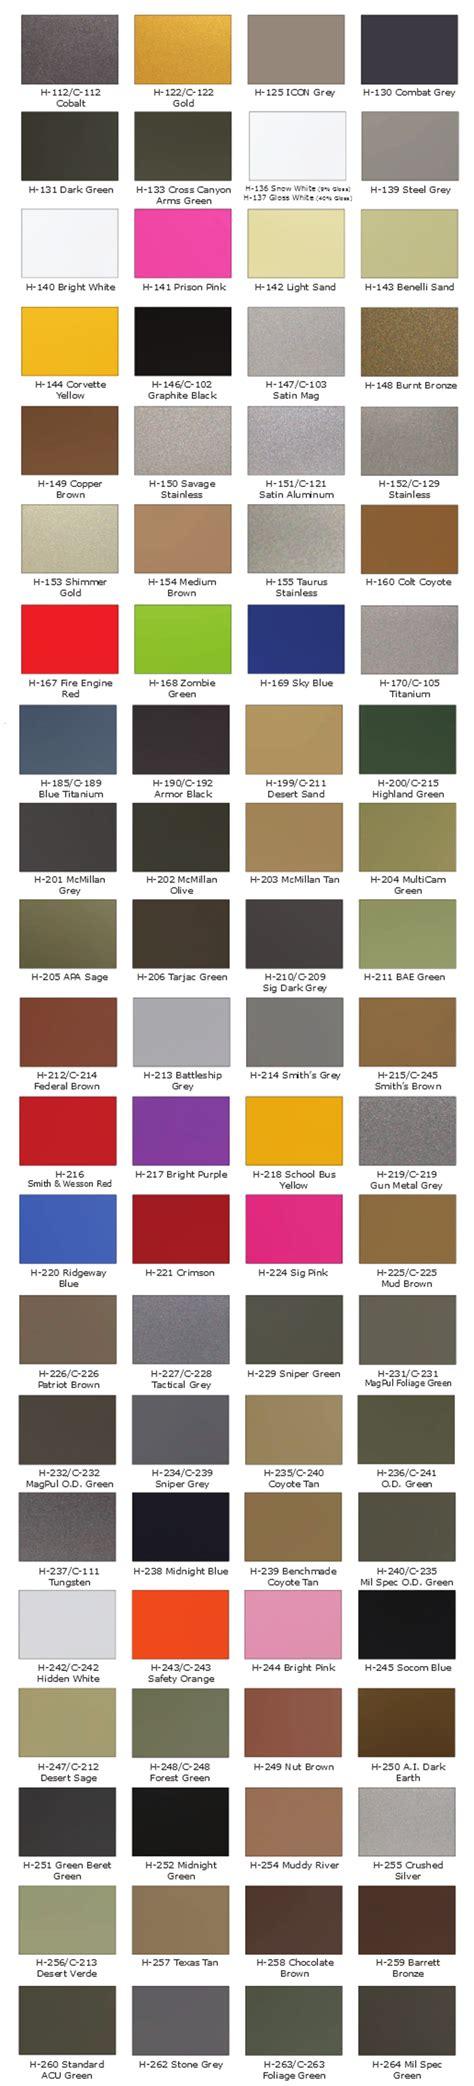 cerakote colors cerakote color chart 71197873 jpg ayucar